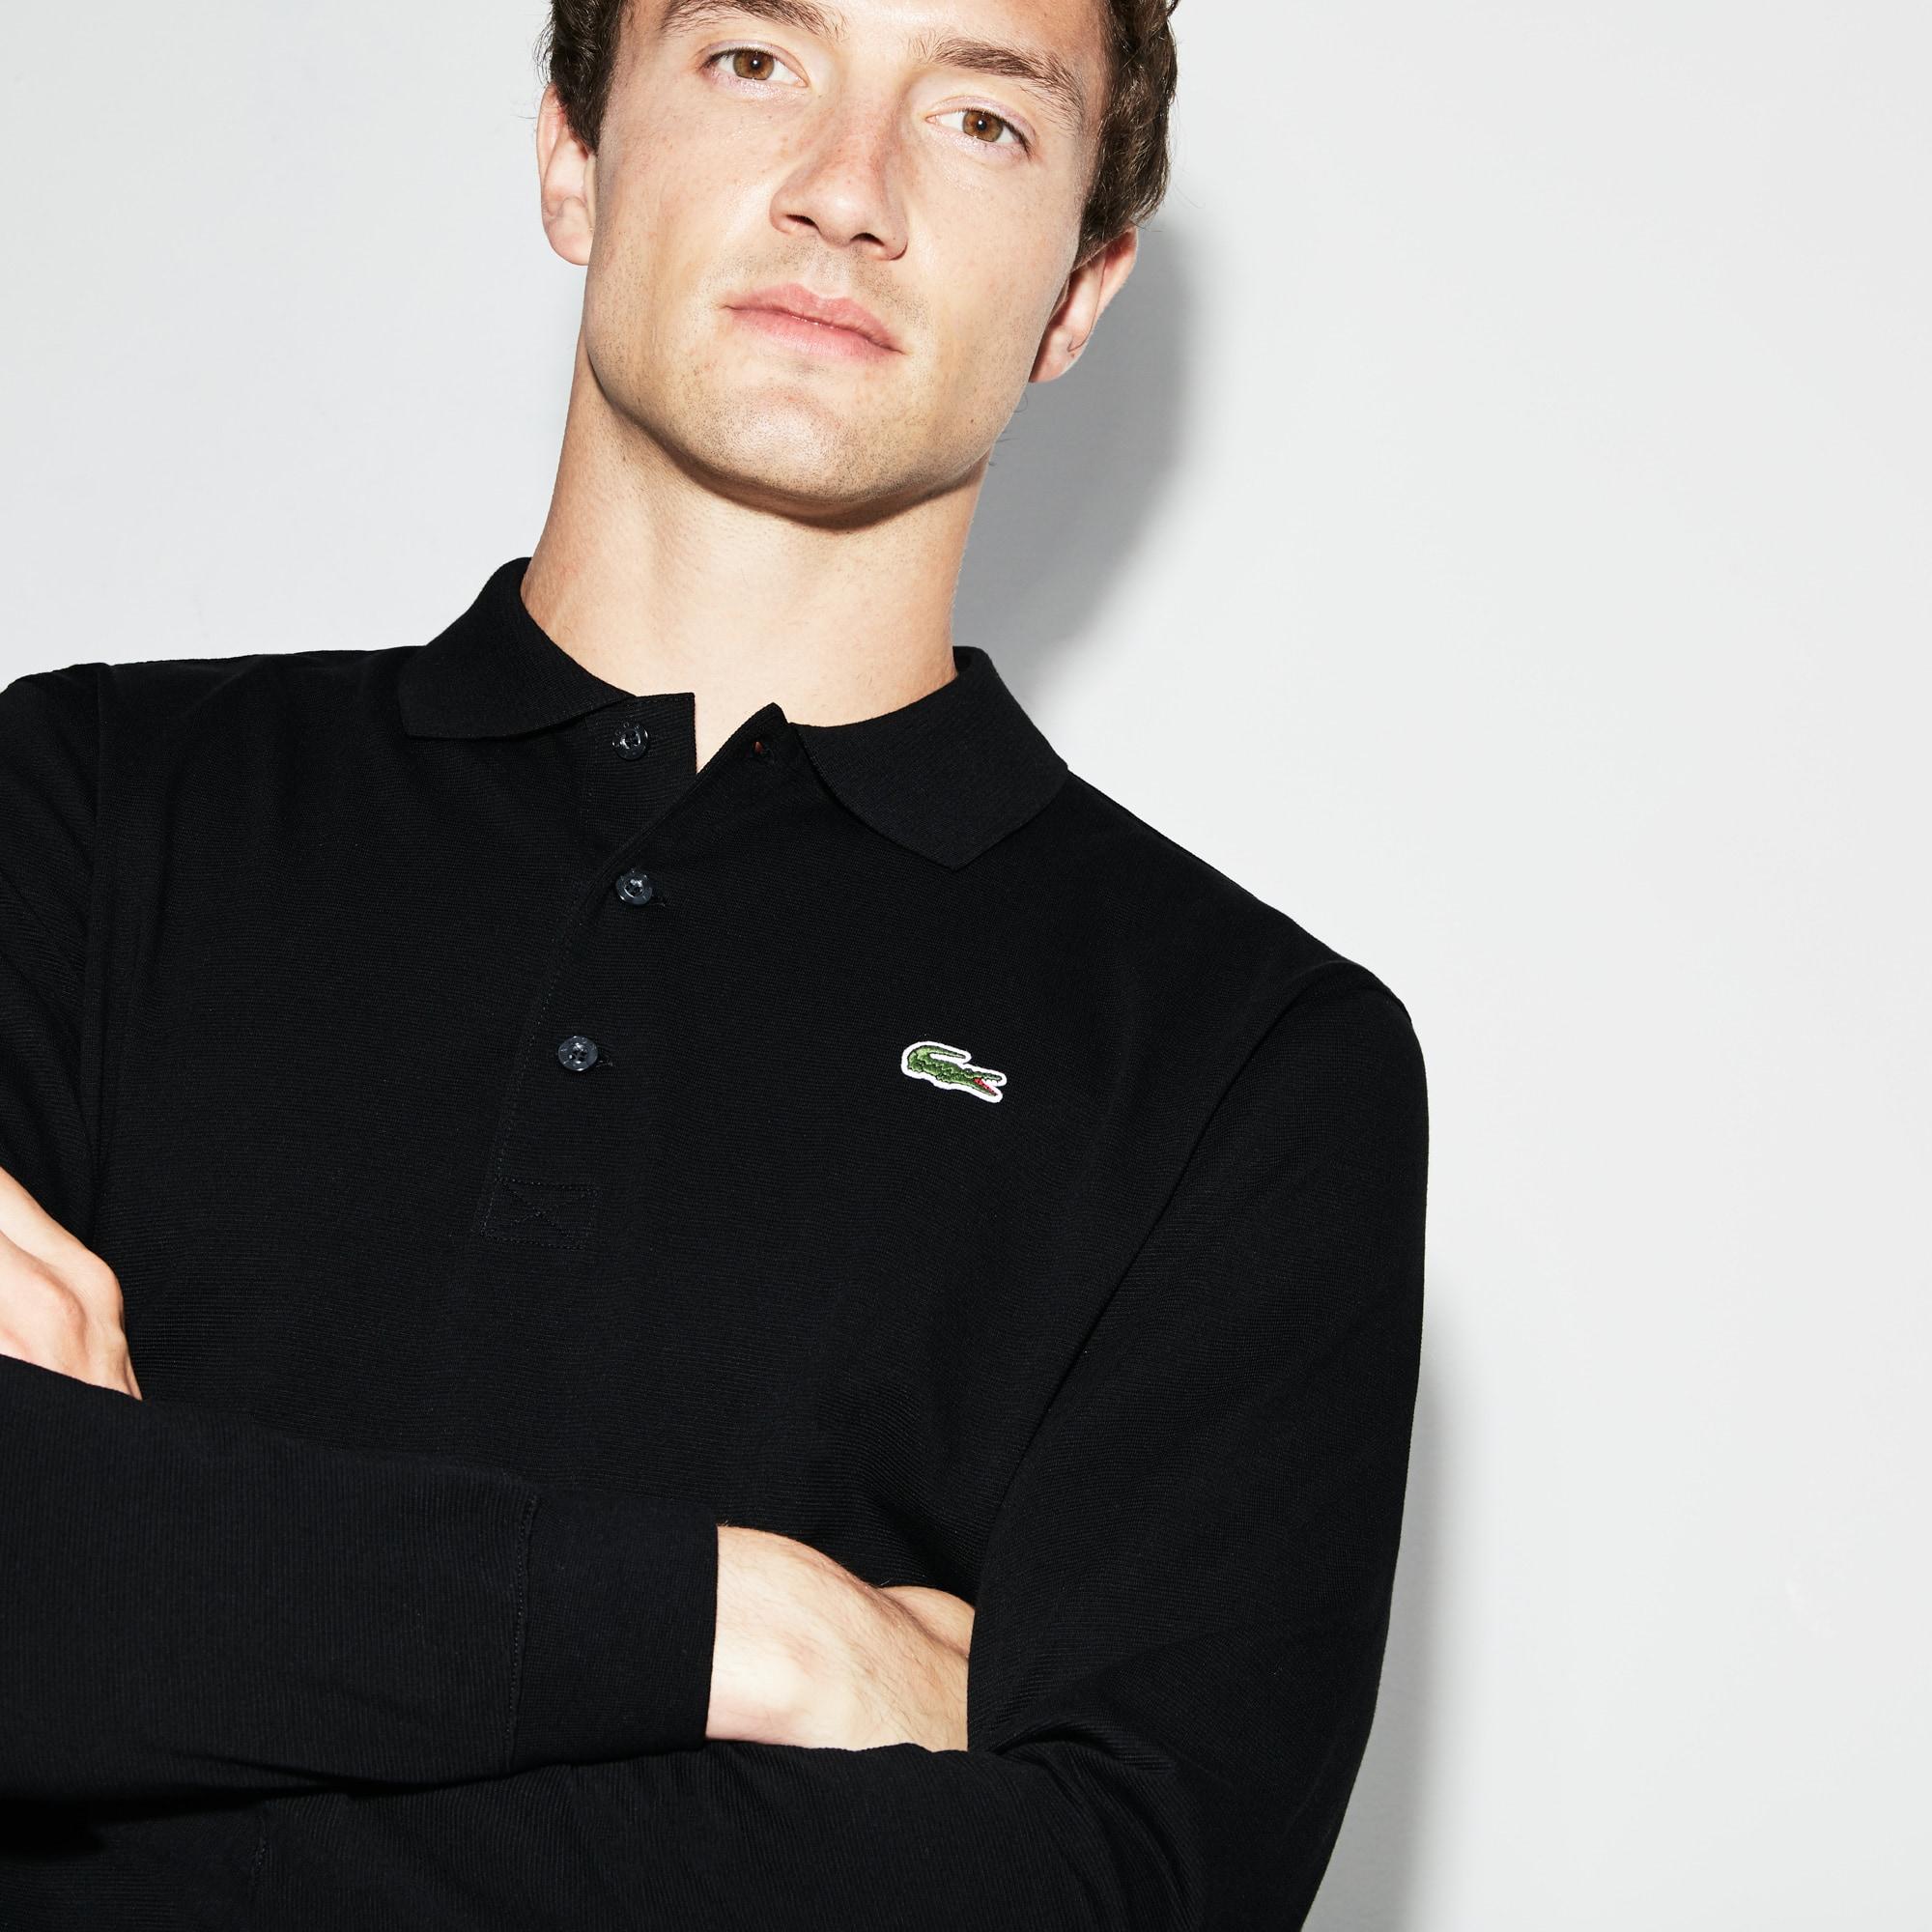 Men's Lacoste SPORT Ultra-Light Cotton Tennis Polo